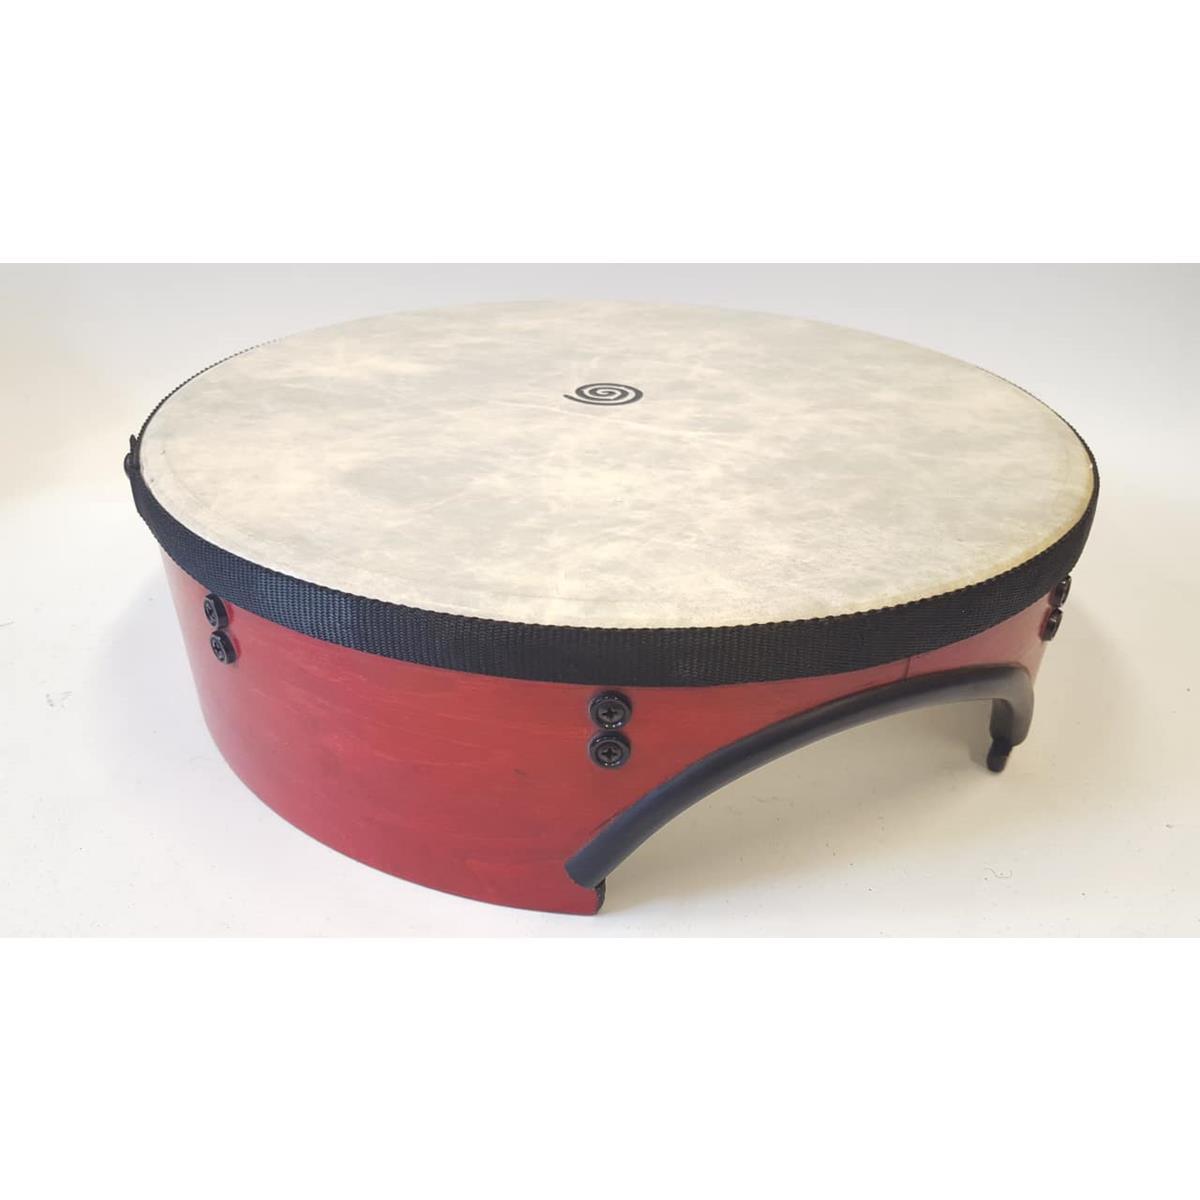 REMO FRAME DRUM 12 - Batterie / Percussioni Percussioni - Varie